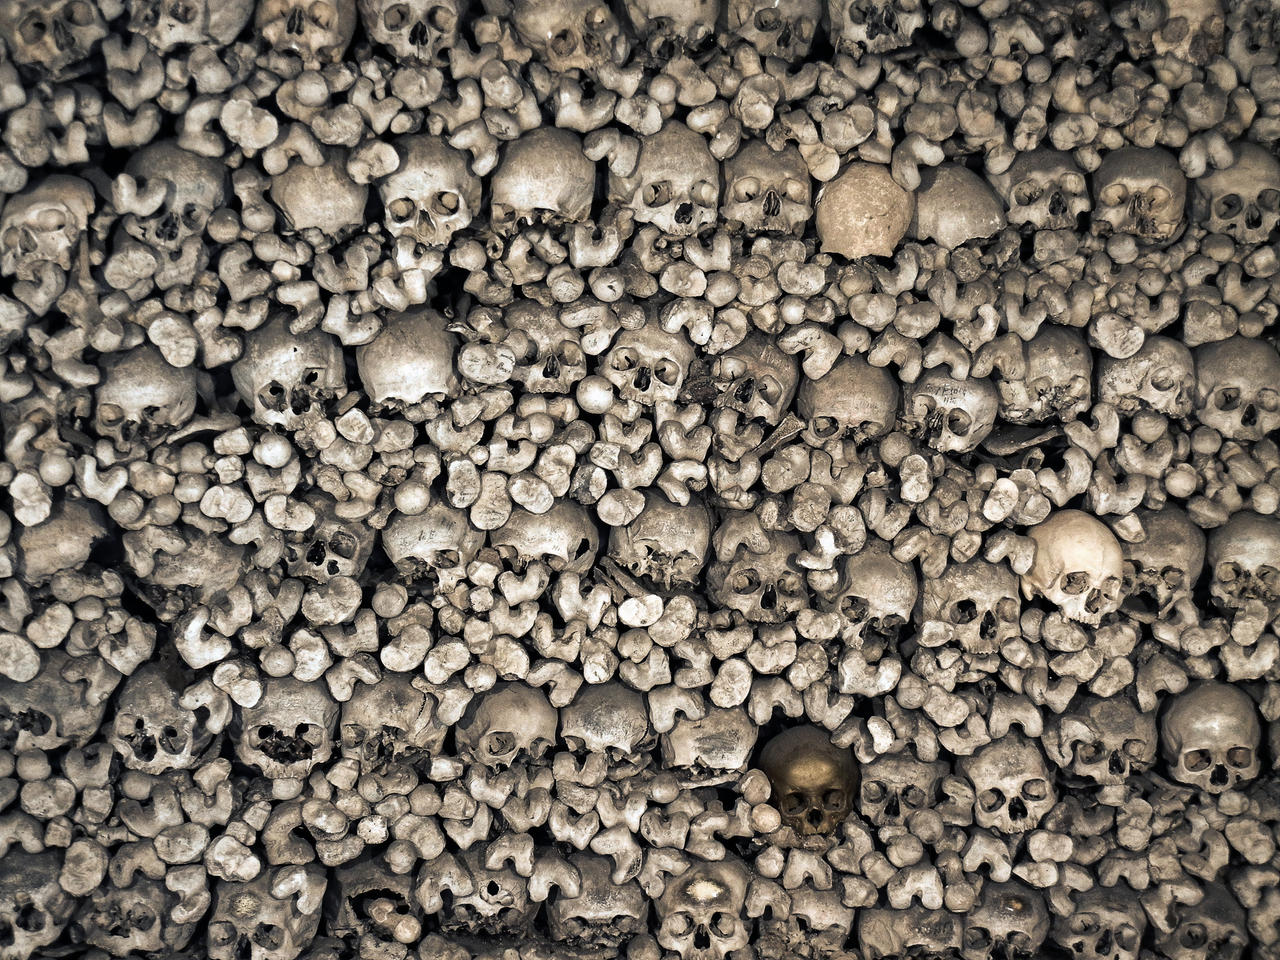 Skulls II by fumar-porros